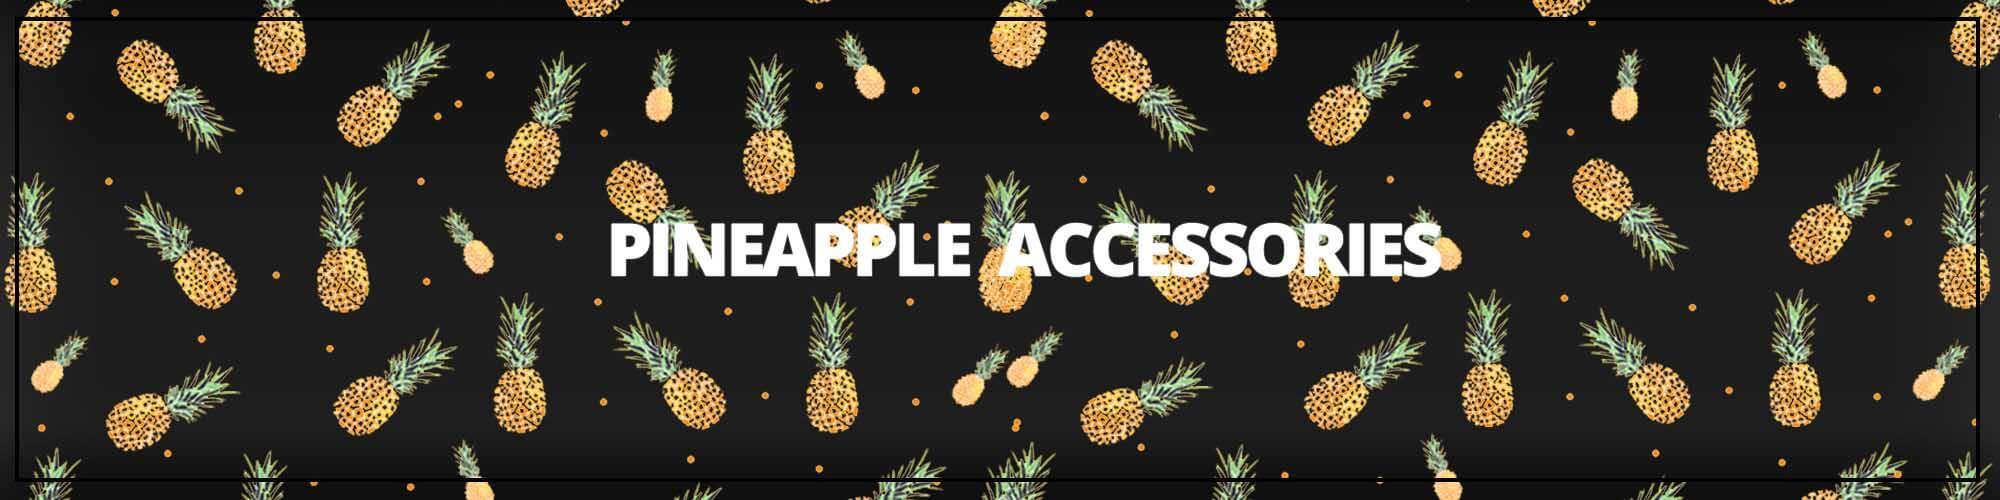 Großhandel Mode-Accessoires | Taschen Schals & Schmuck banner 3